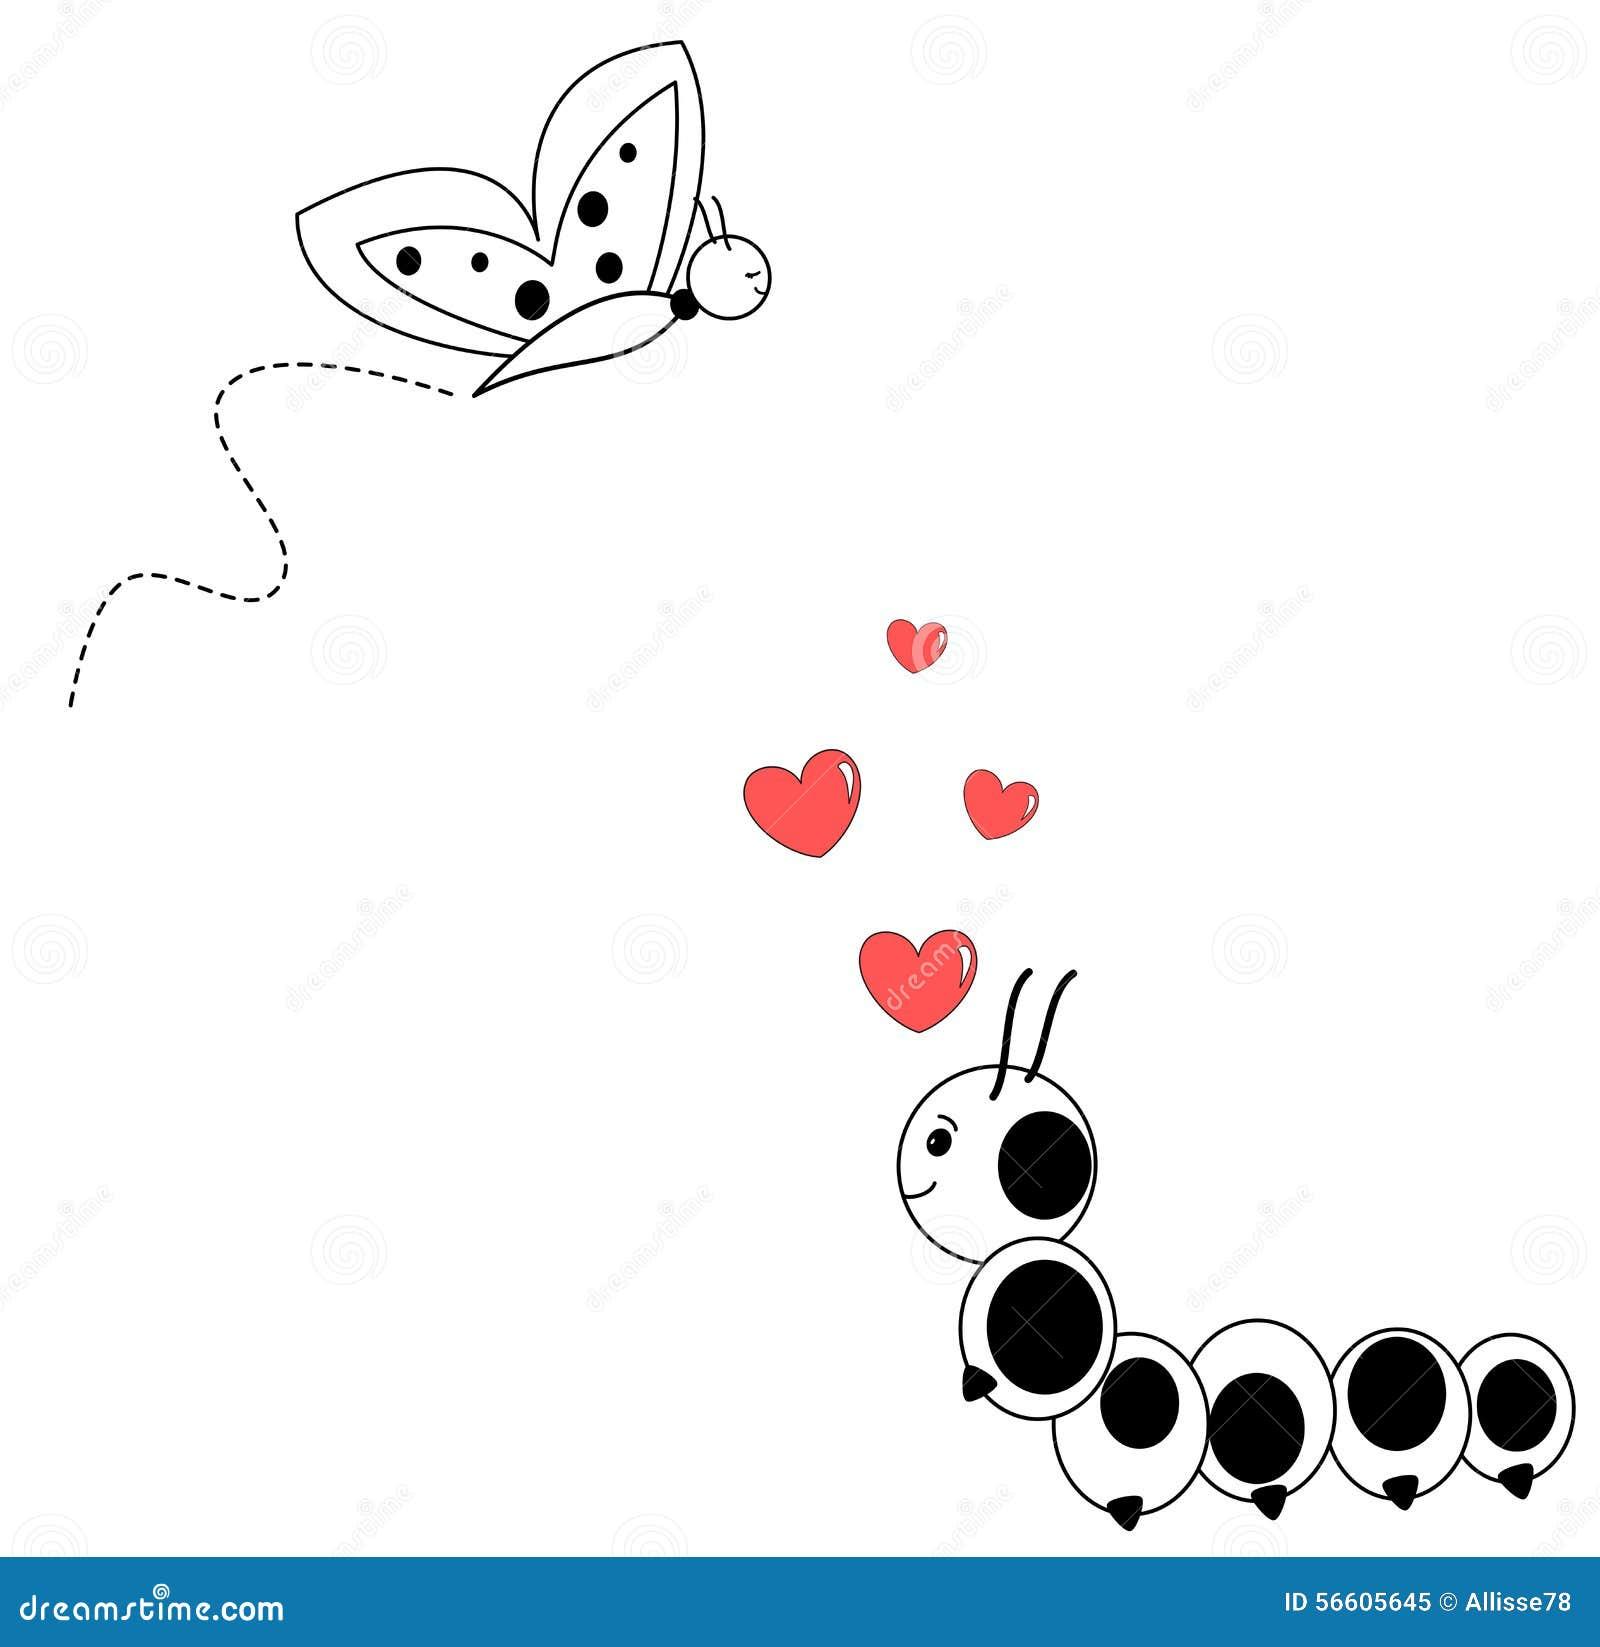 Caterpillar In Love With Cute Butterfly Cartoon Illustration Stock Vector Illustration Of Humor Caterpillar 56605645